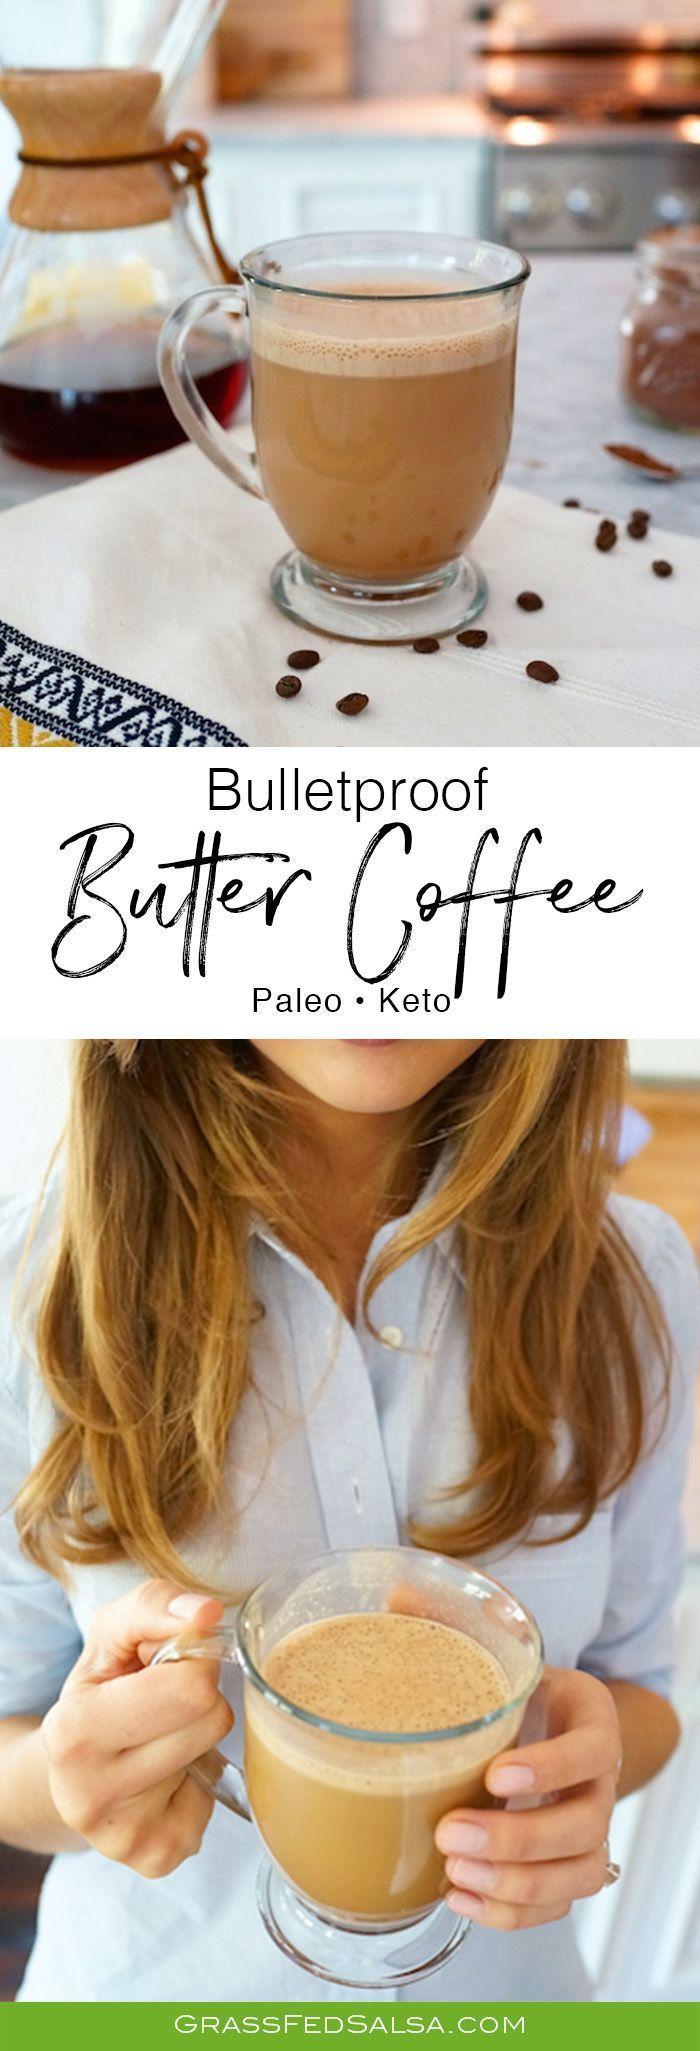 Butter Coffee Recipe Butter coffee recipe, Butter